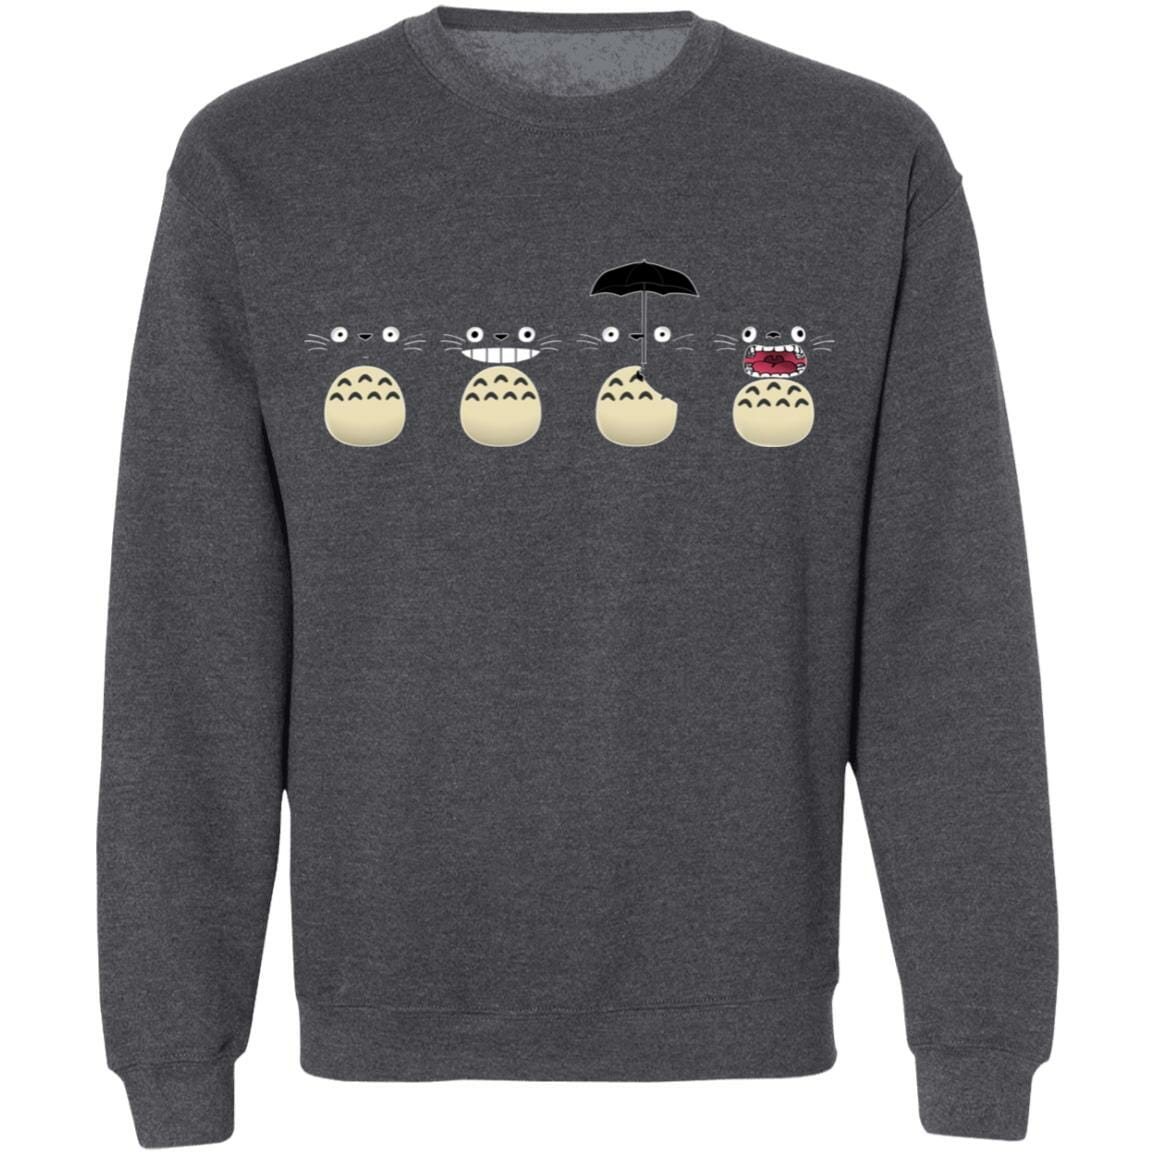 Totoro Faces Sweatshirt